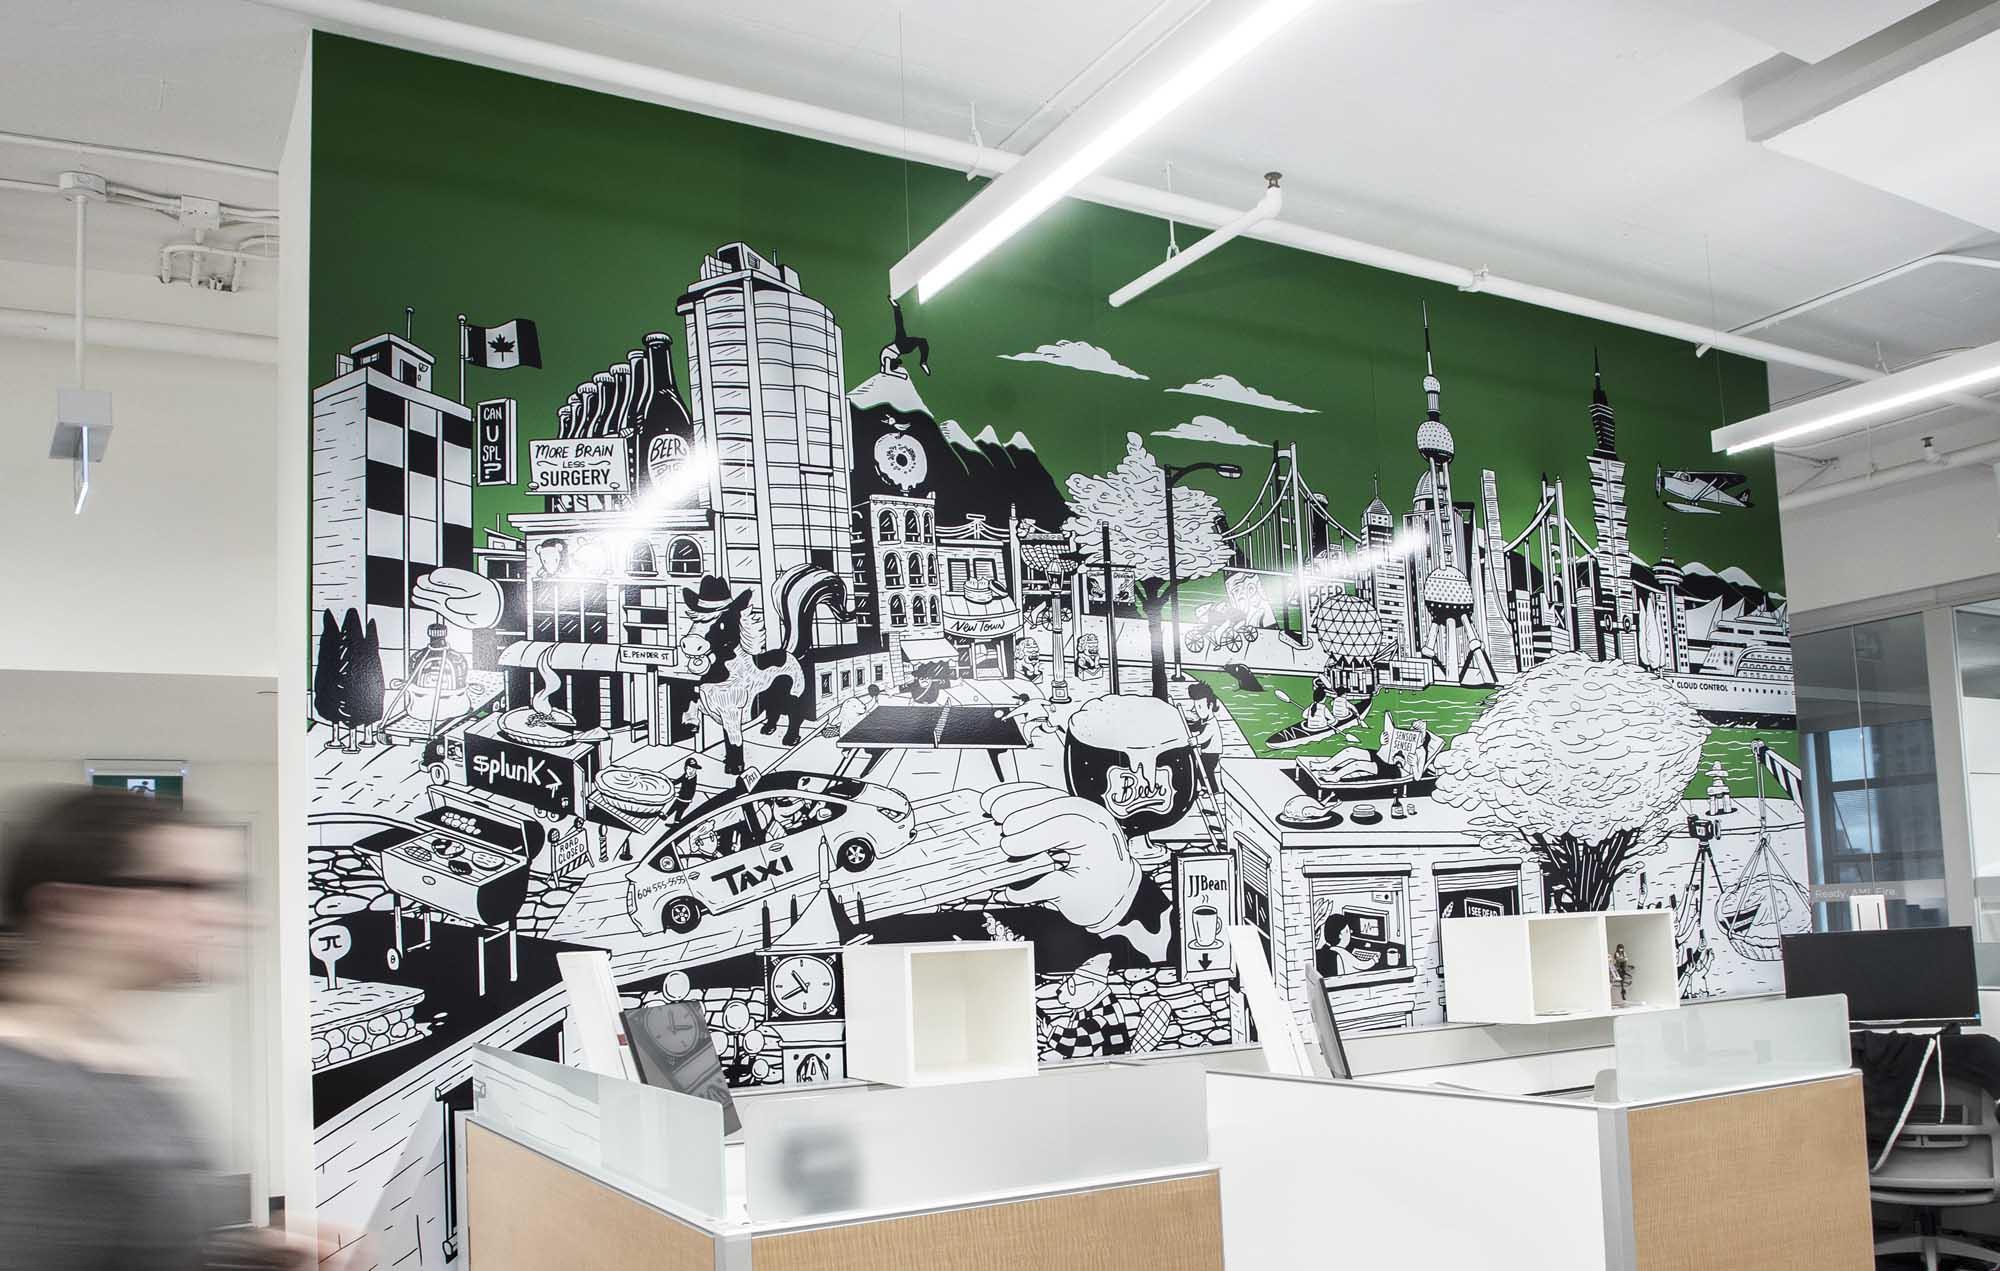 Splunk Technology - Vinyl art and wall panels for Splunk Technology.